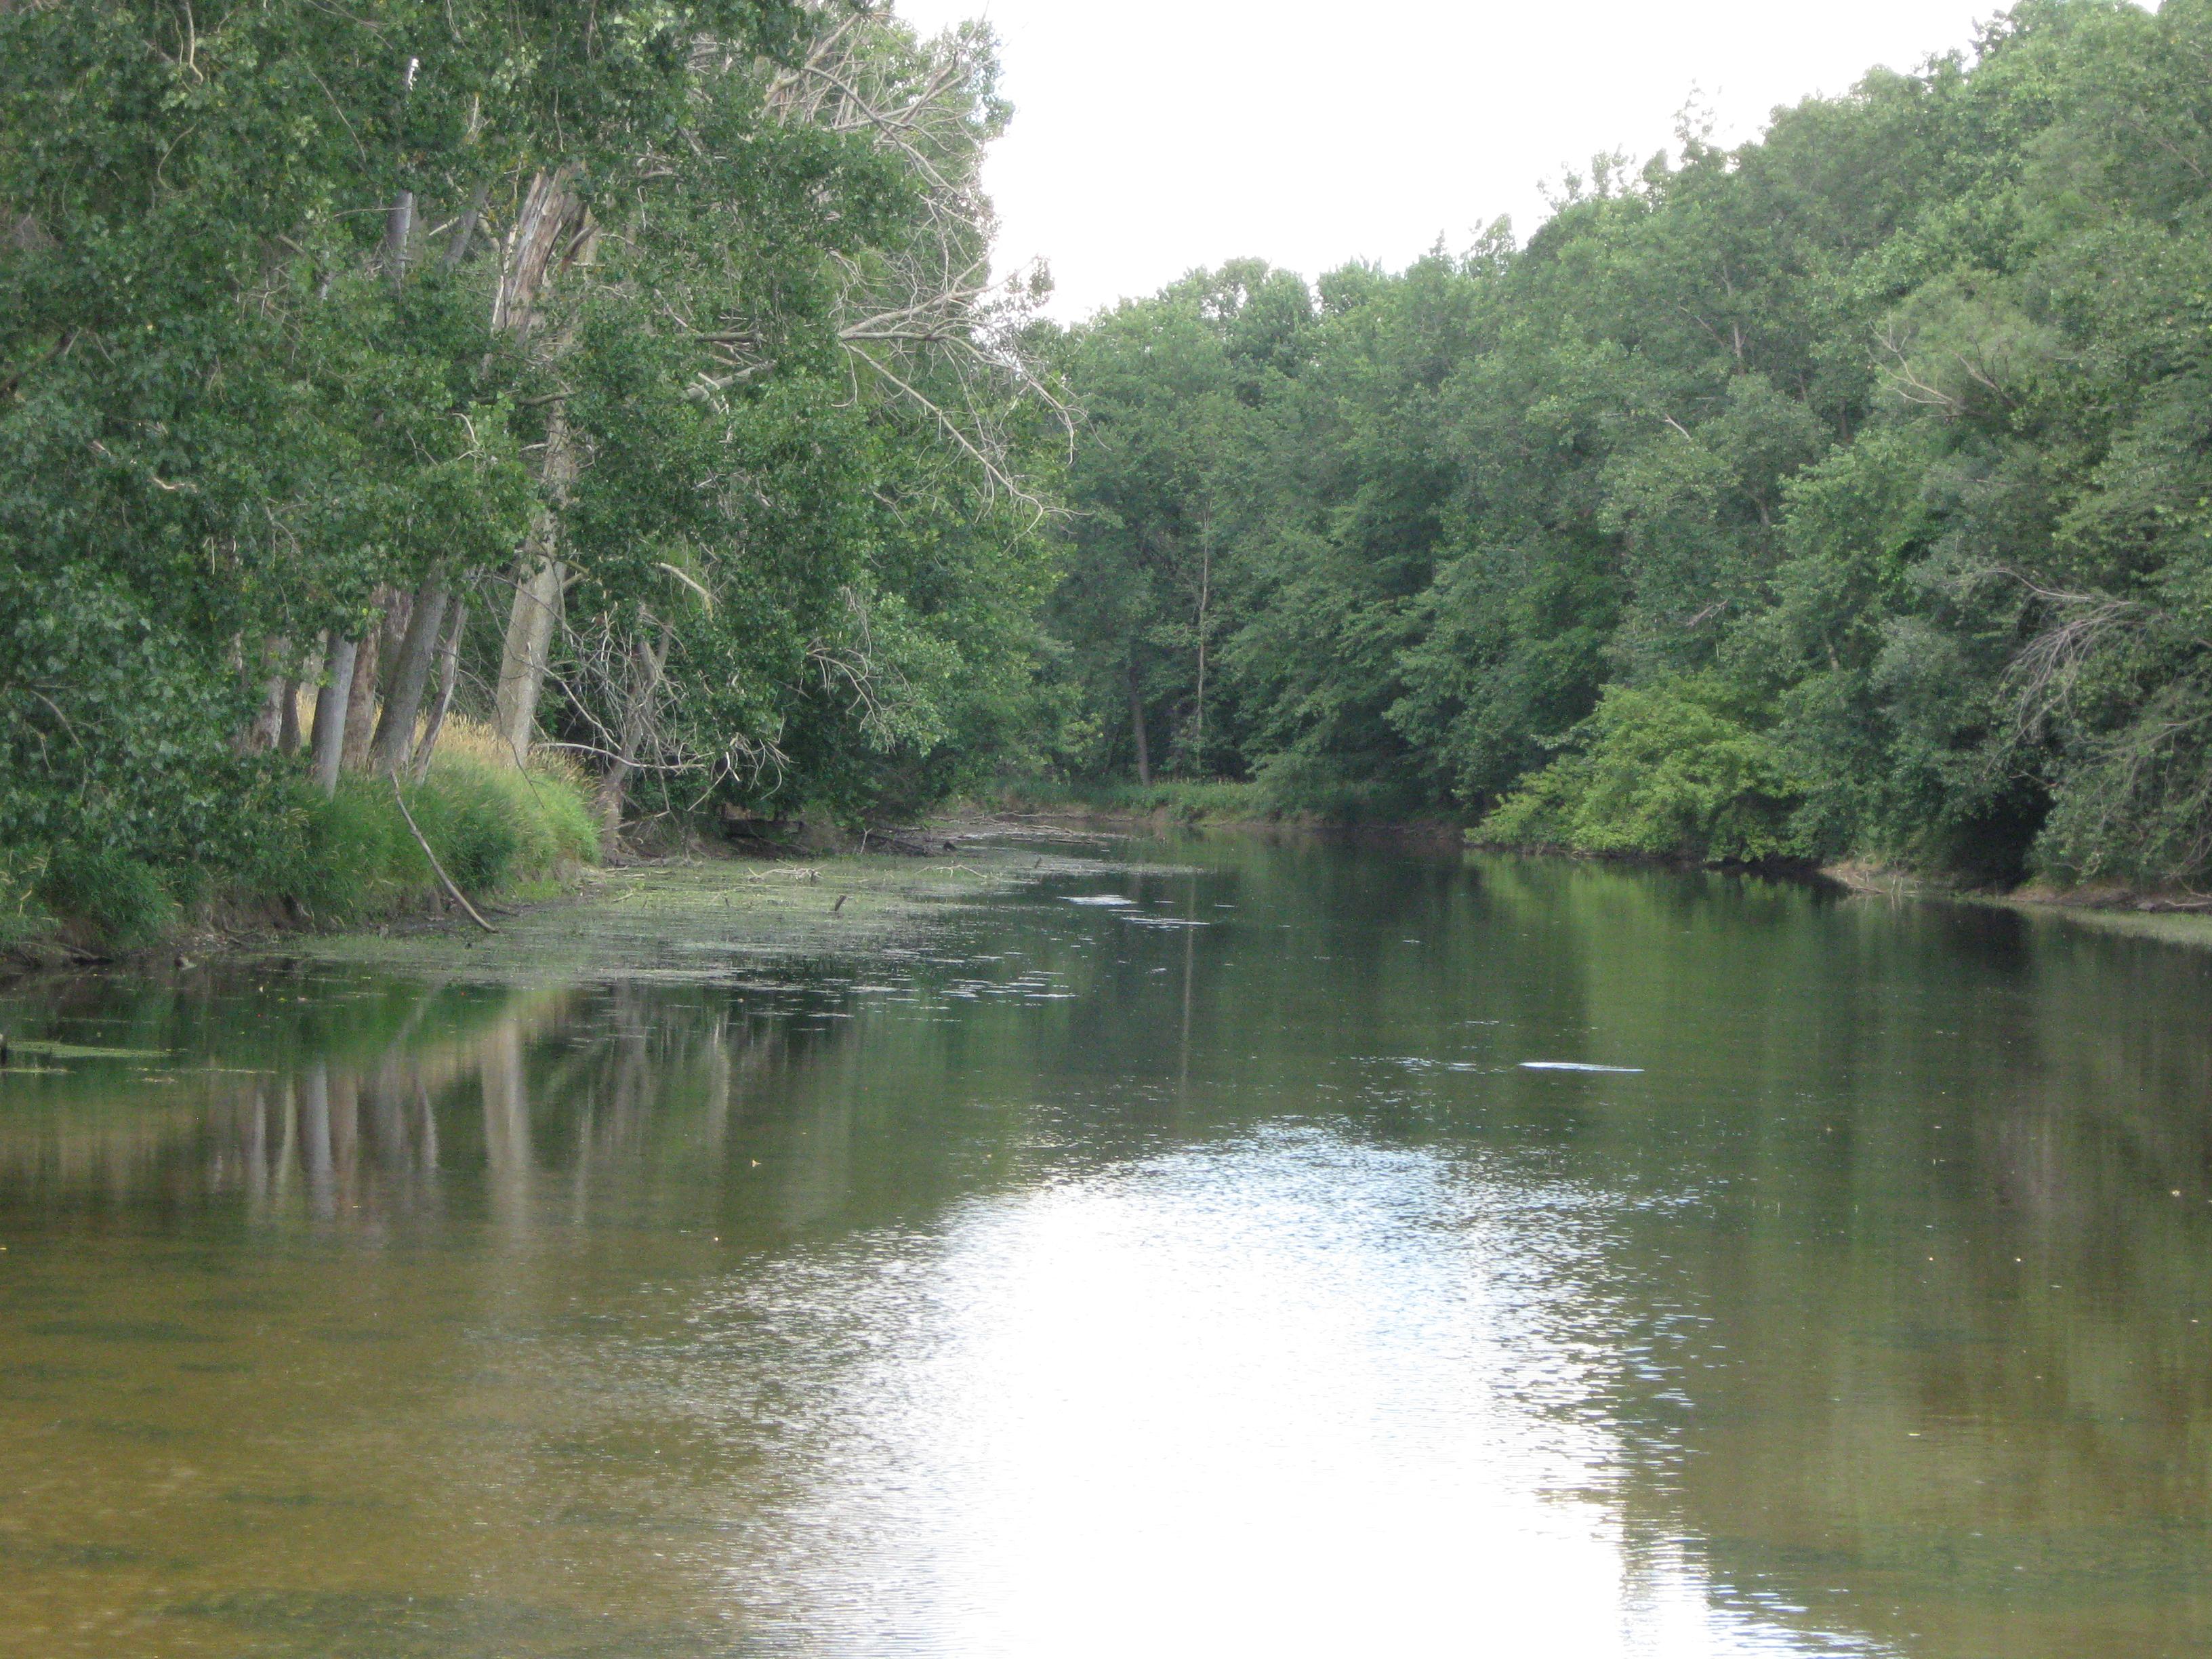 Red cedar fishing now allowed on msu s river wkar